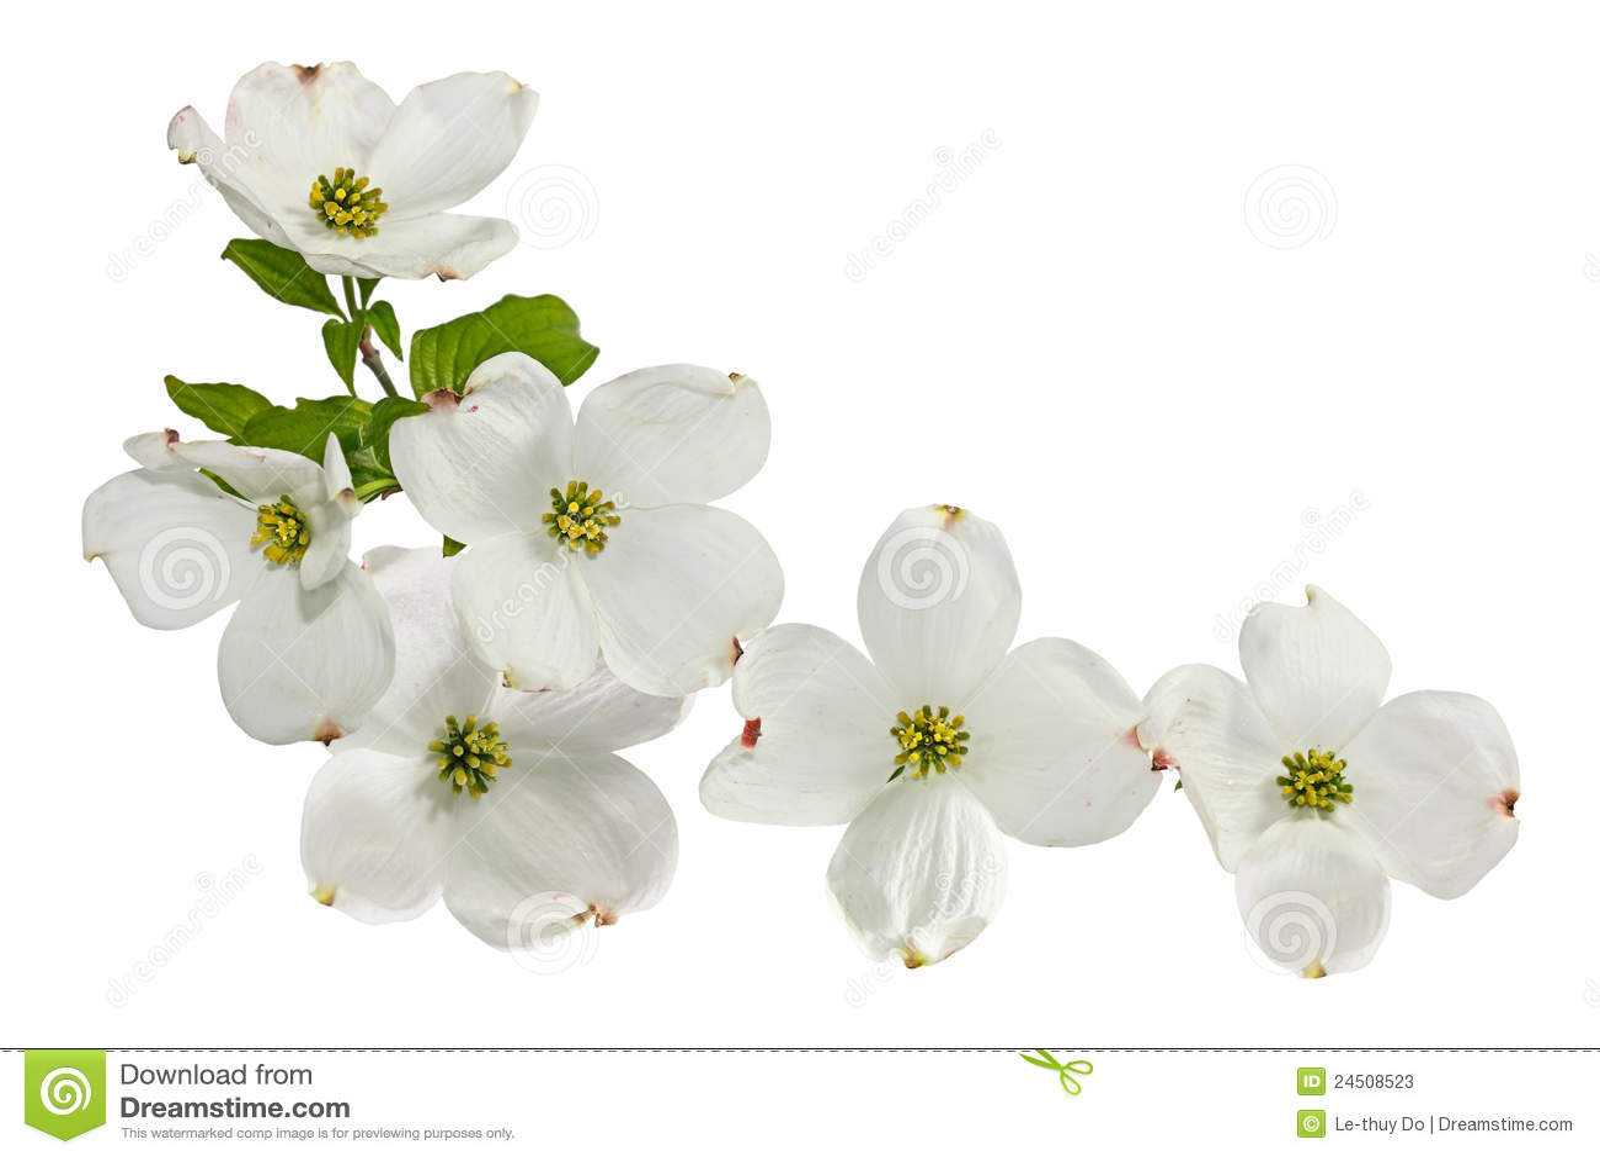 Pink White Dogwood Flowers Stock Image Image Of Pistil 24508523